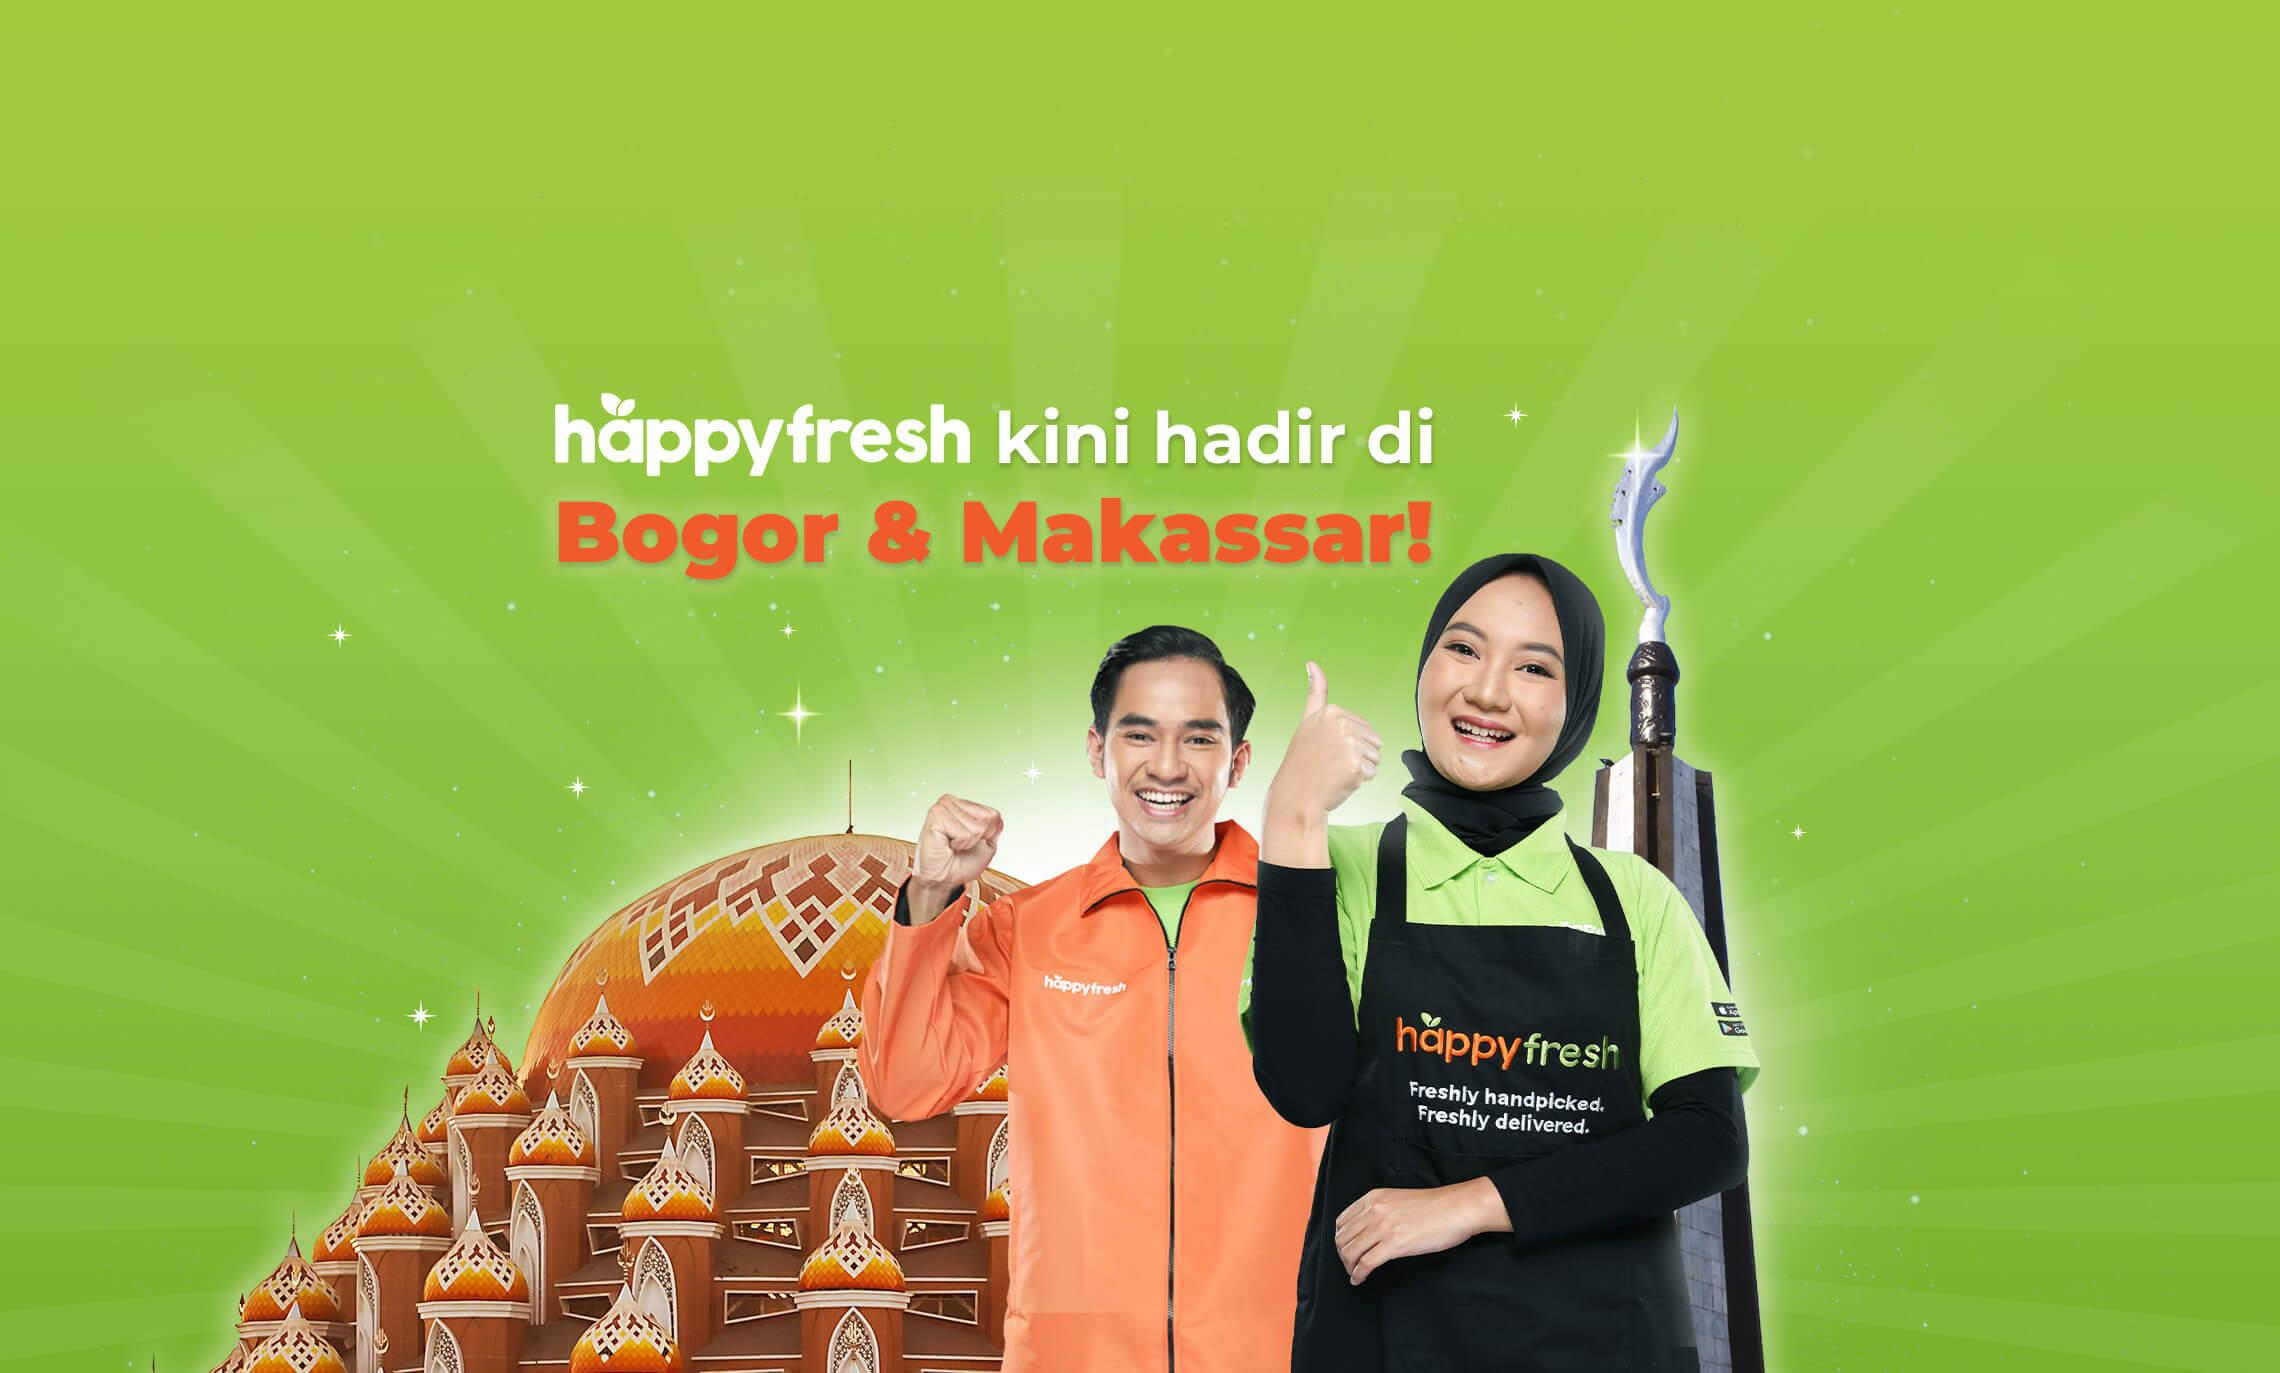 HappyFresh Bogor & Makassar